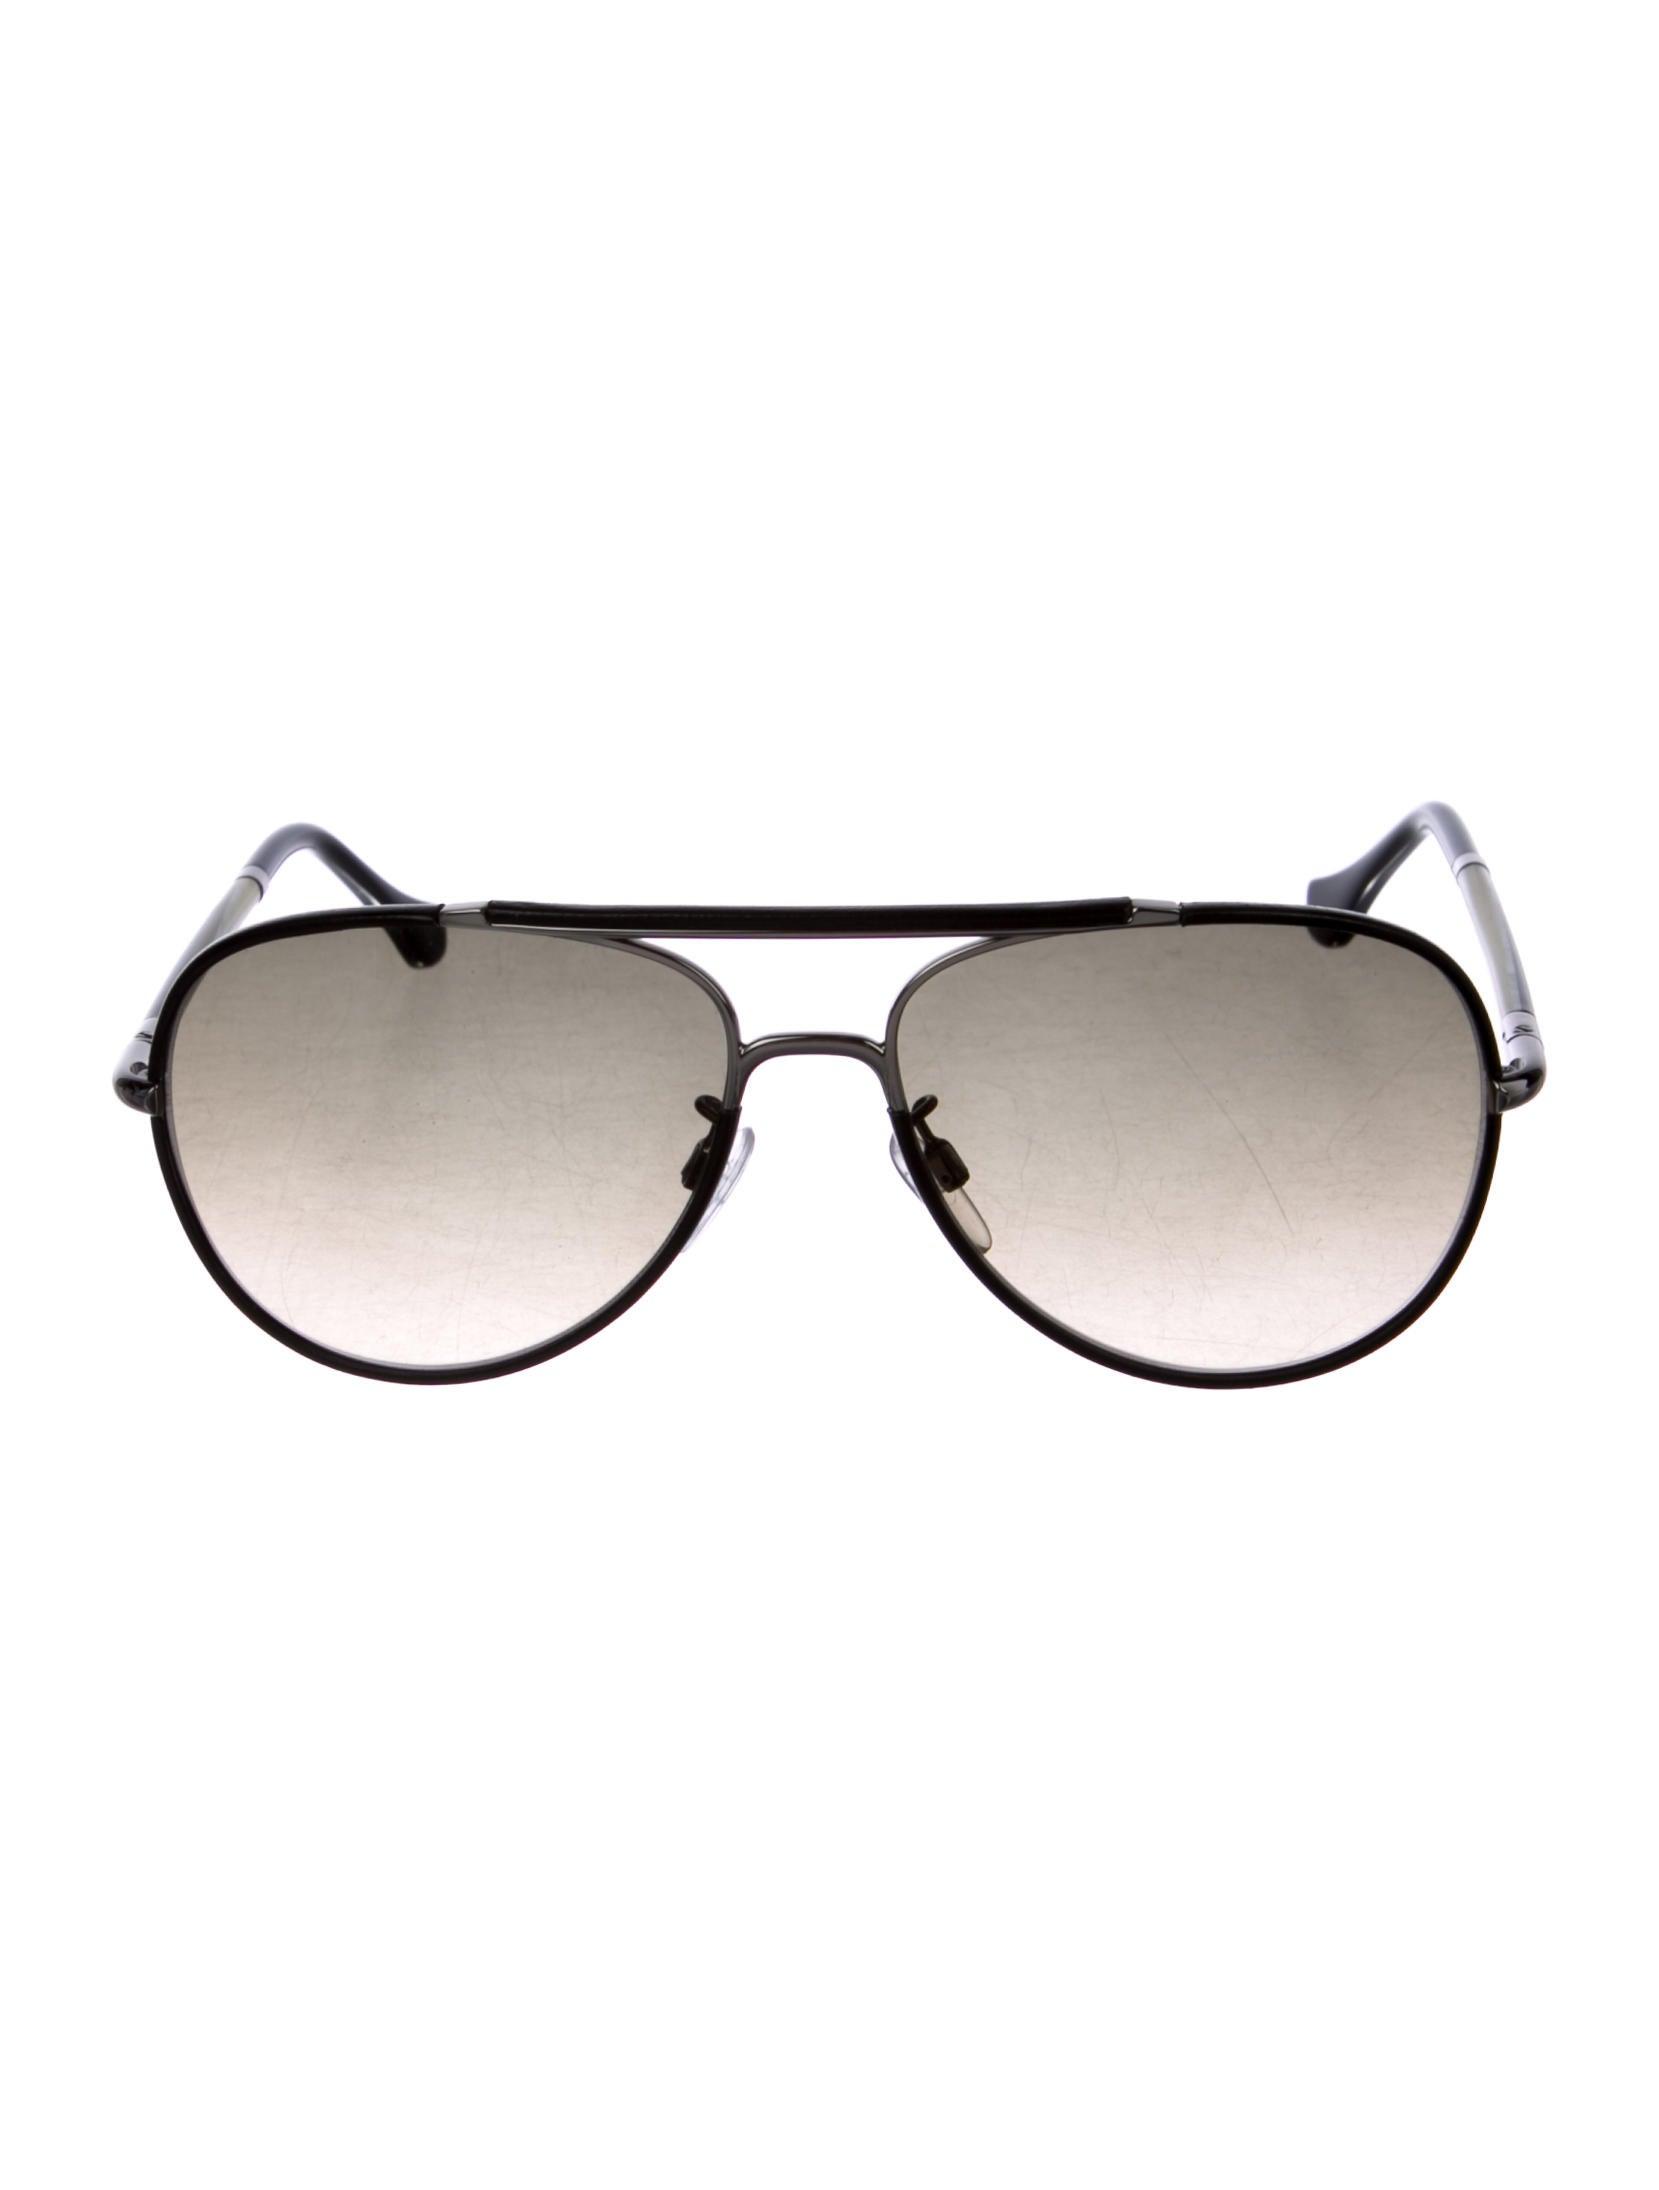 1ee97b558 Balenciaga Leather-Trimmed Aviator Sunglasses - Accessories ...